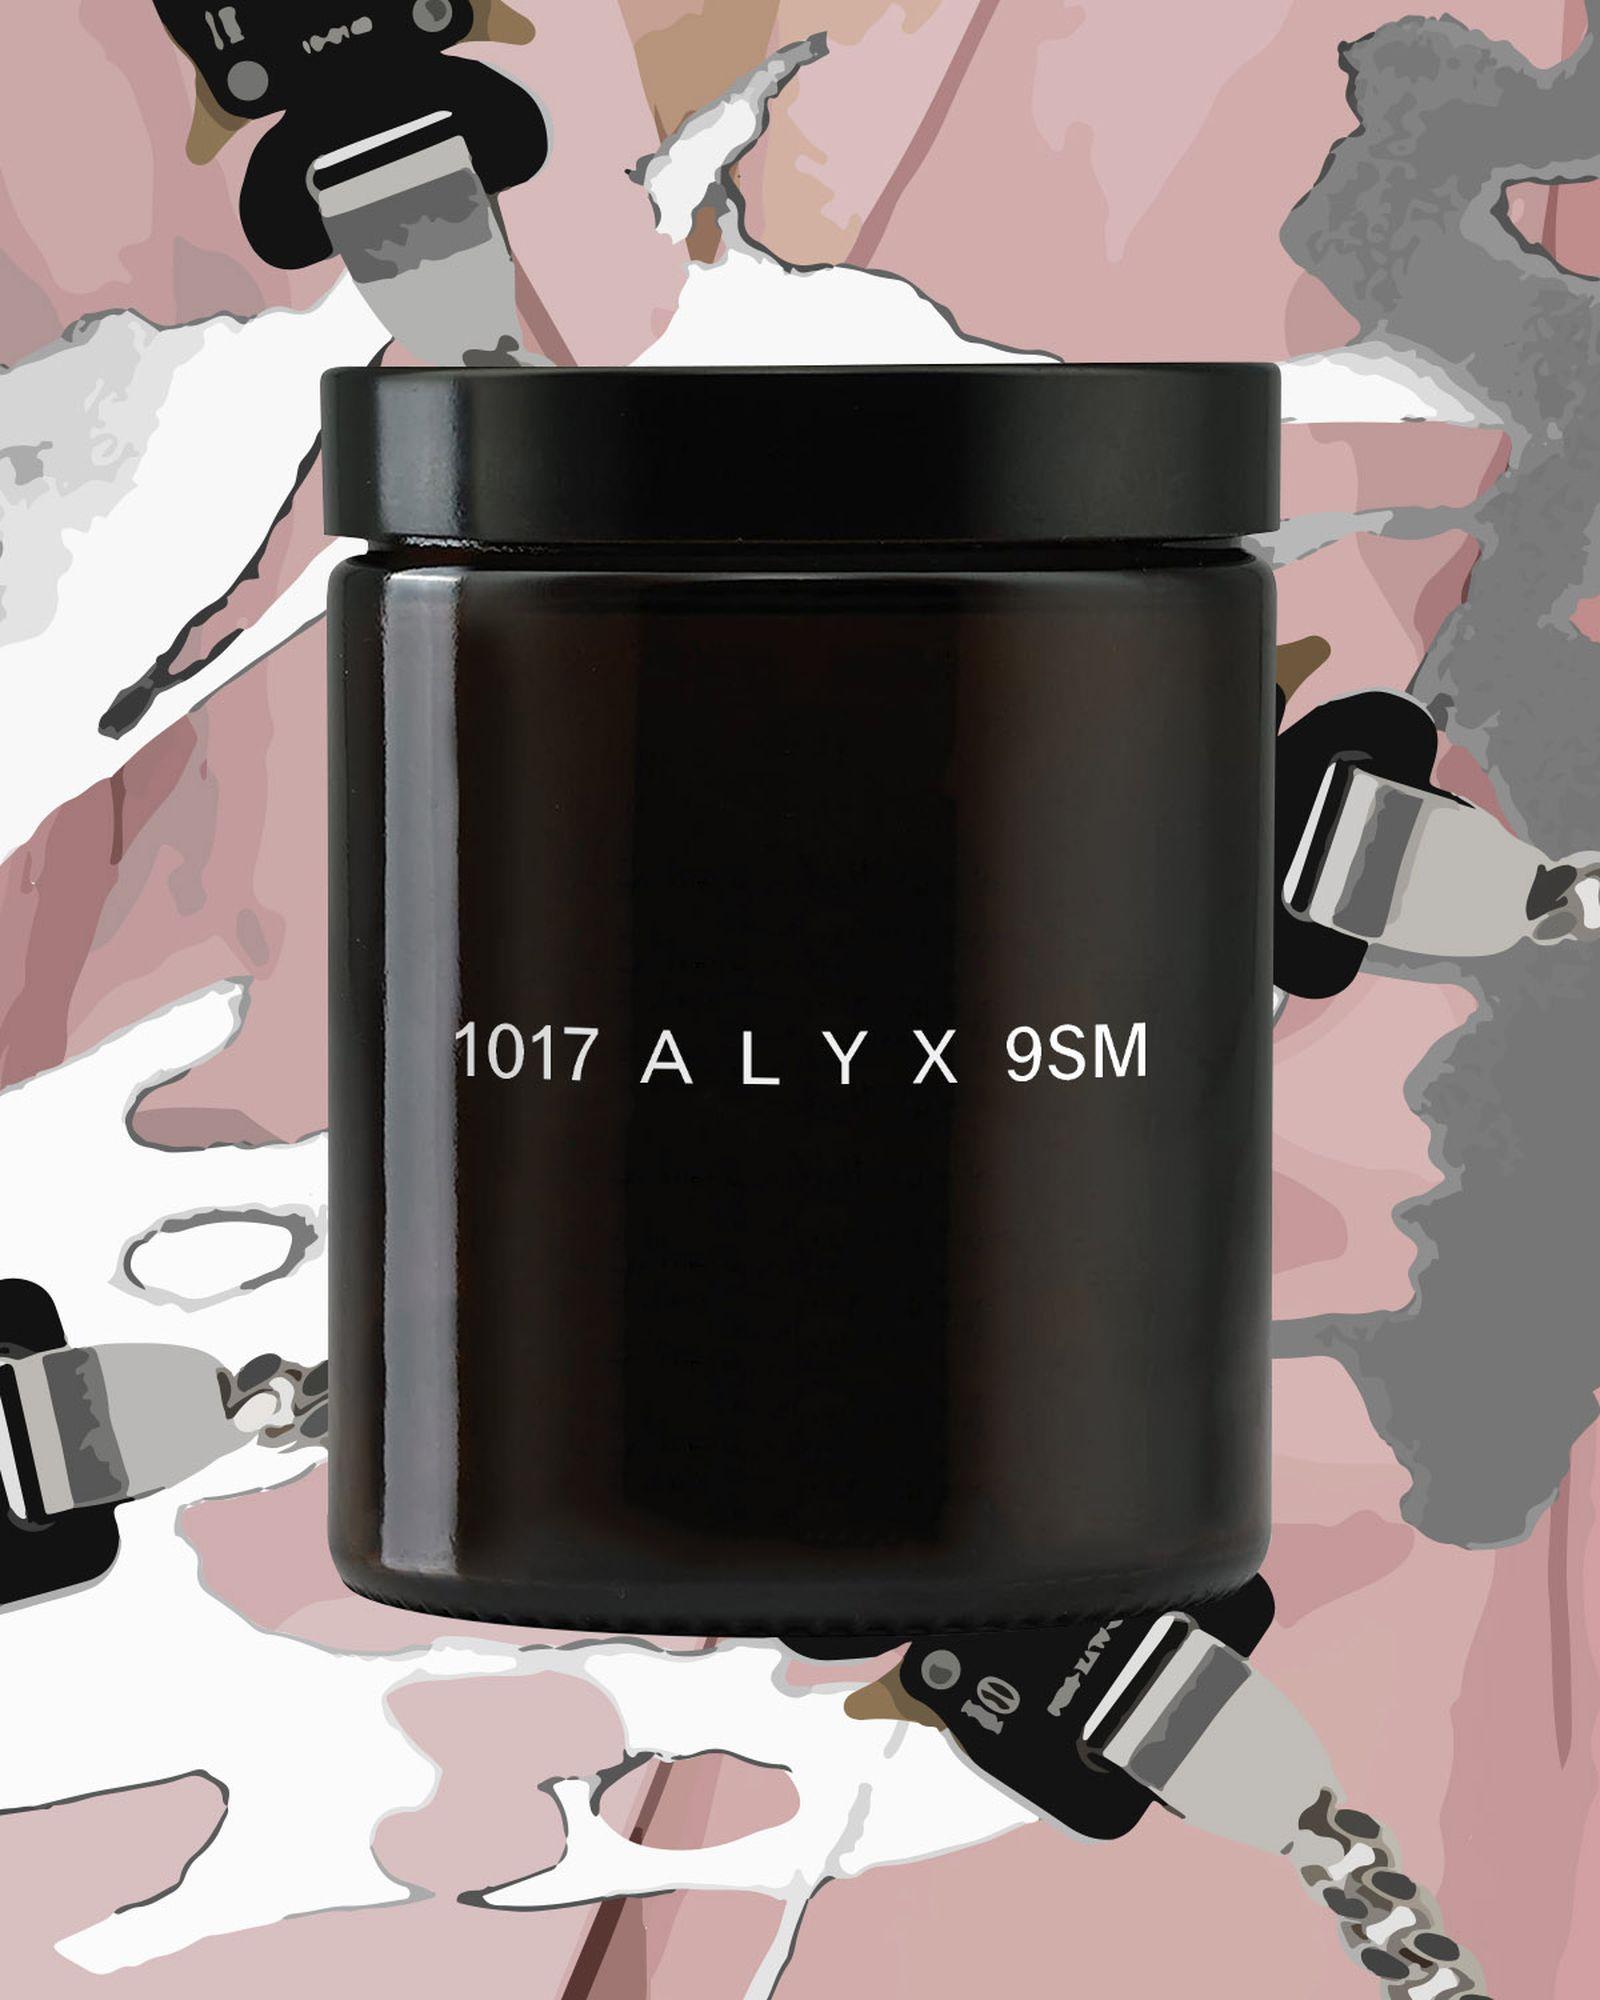 skincare-fashion-brands-Alyx_The Nue Co_1200x1500_dev01